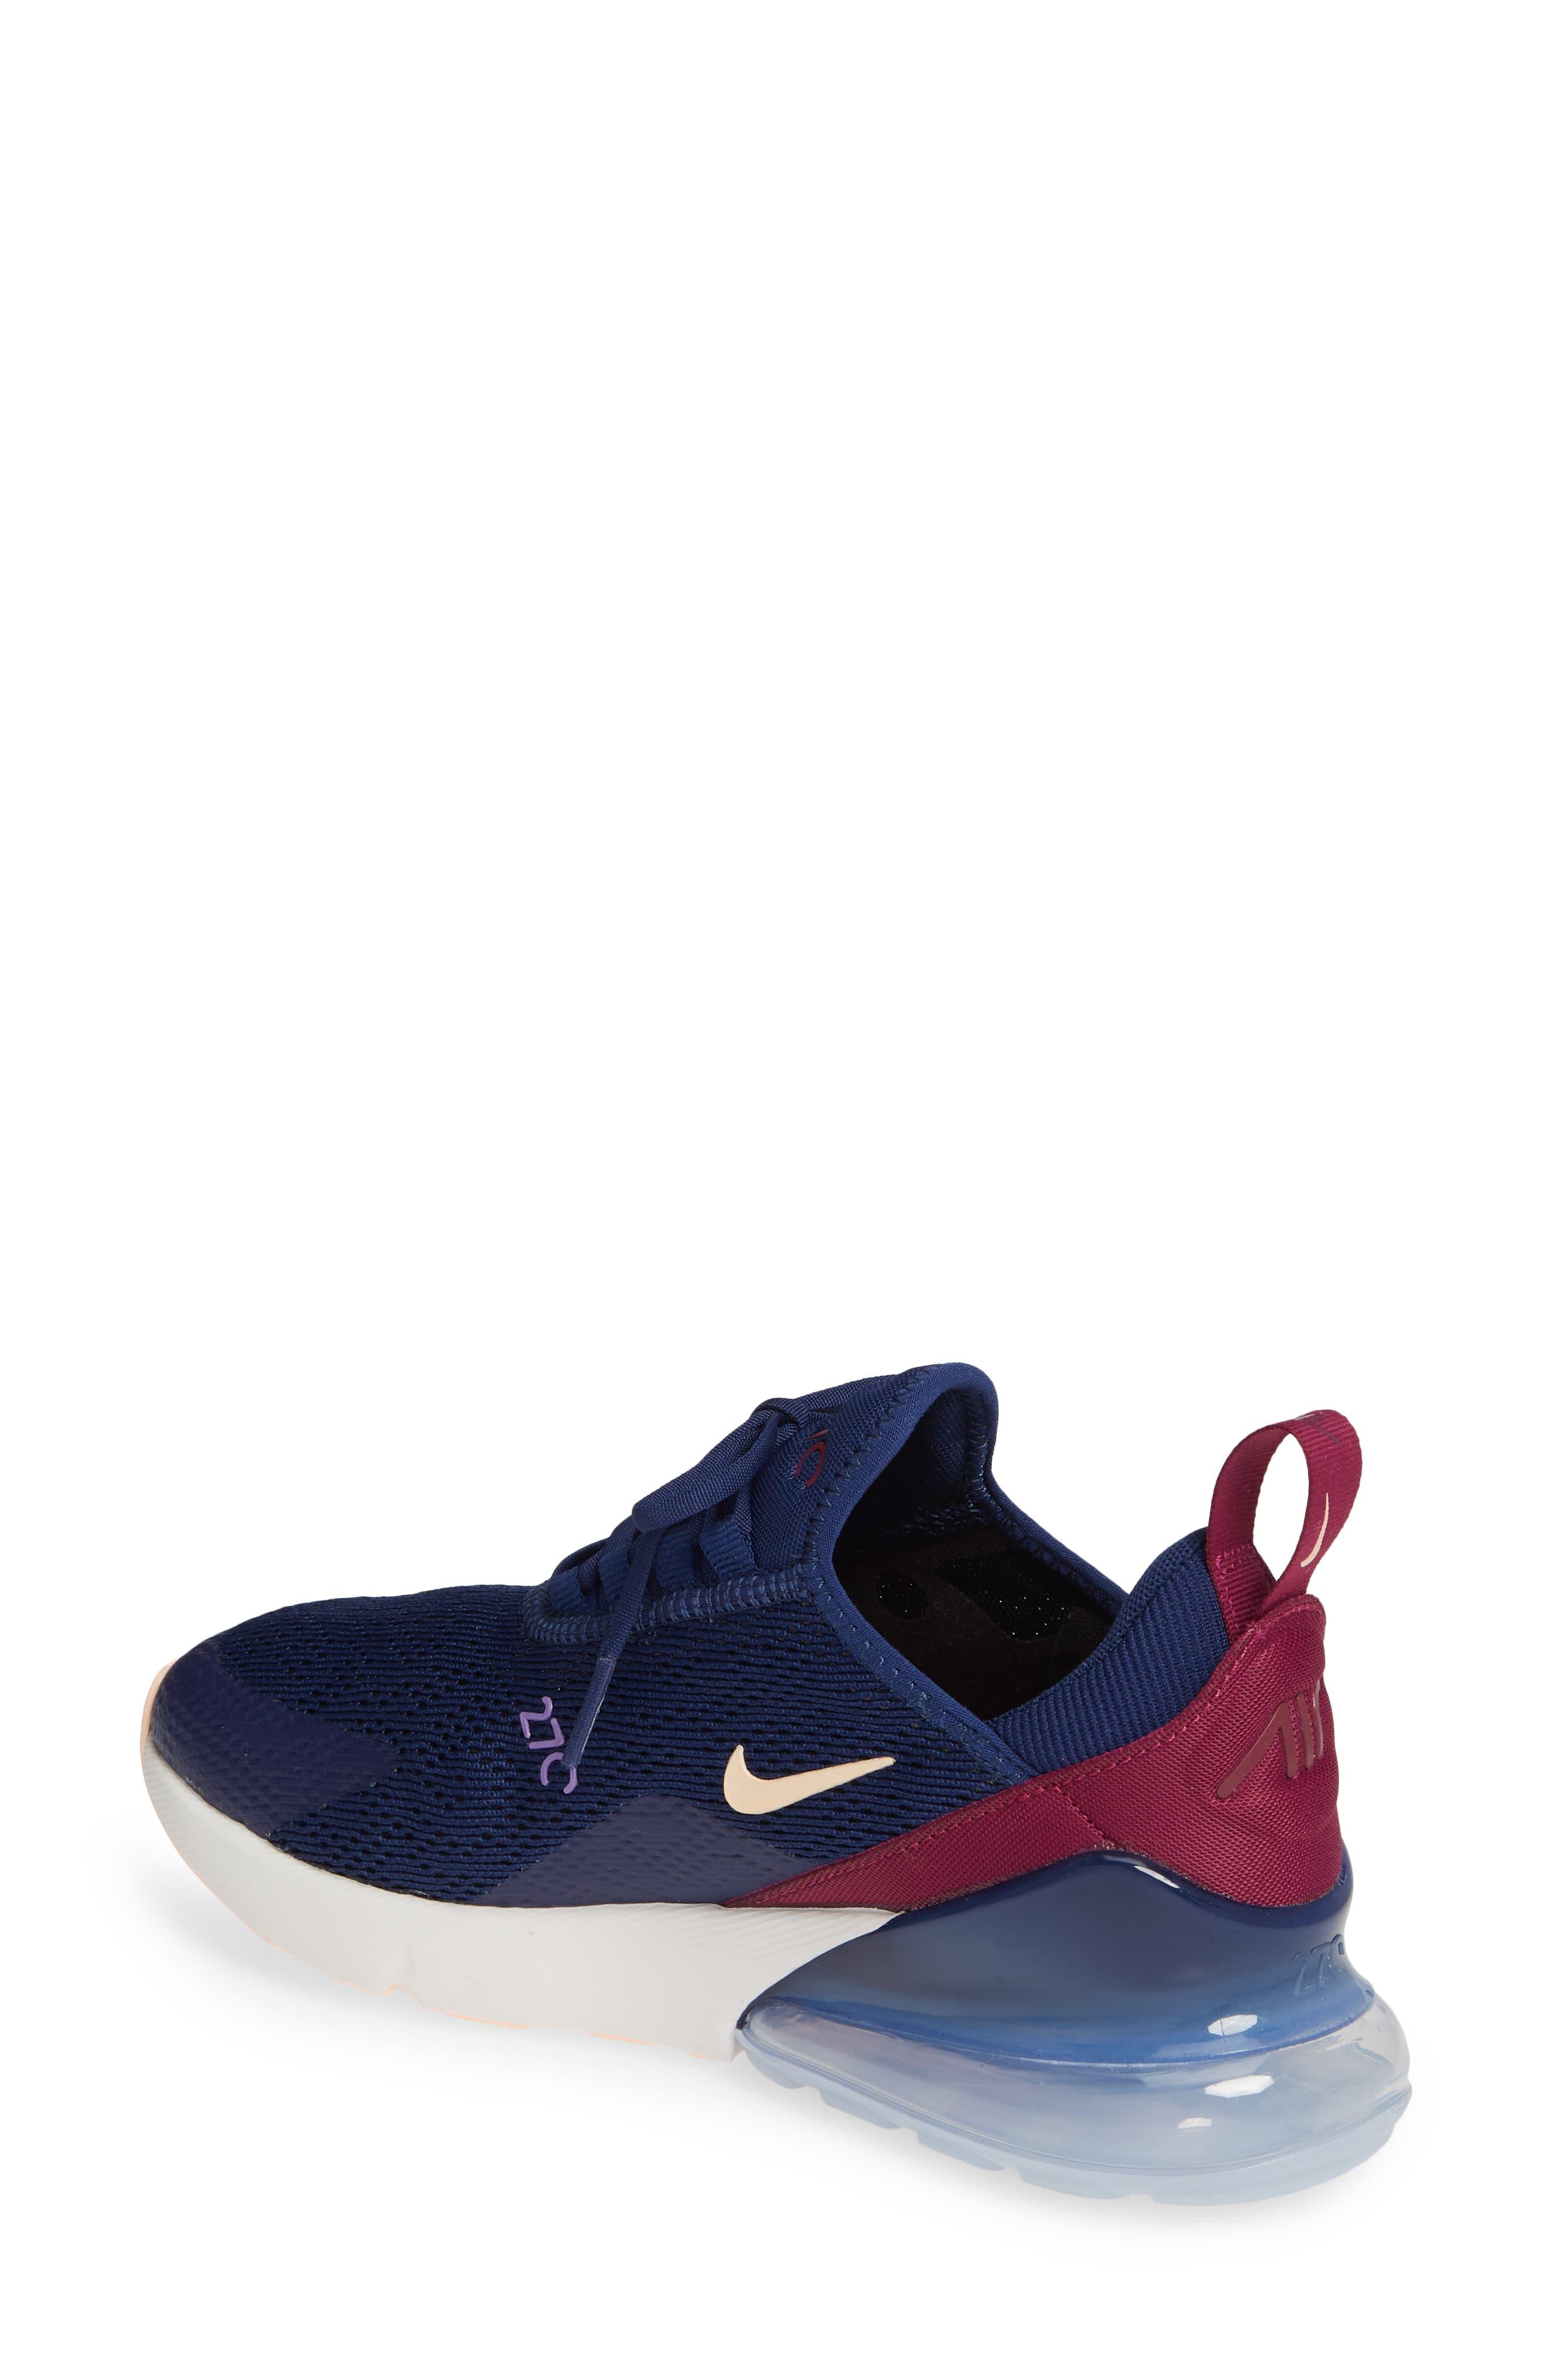 621a8772469b3 For Women Nike Air Max Shoes